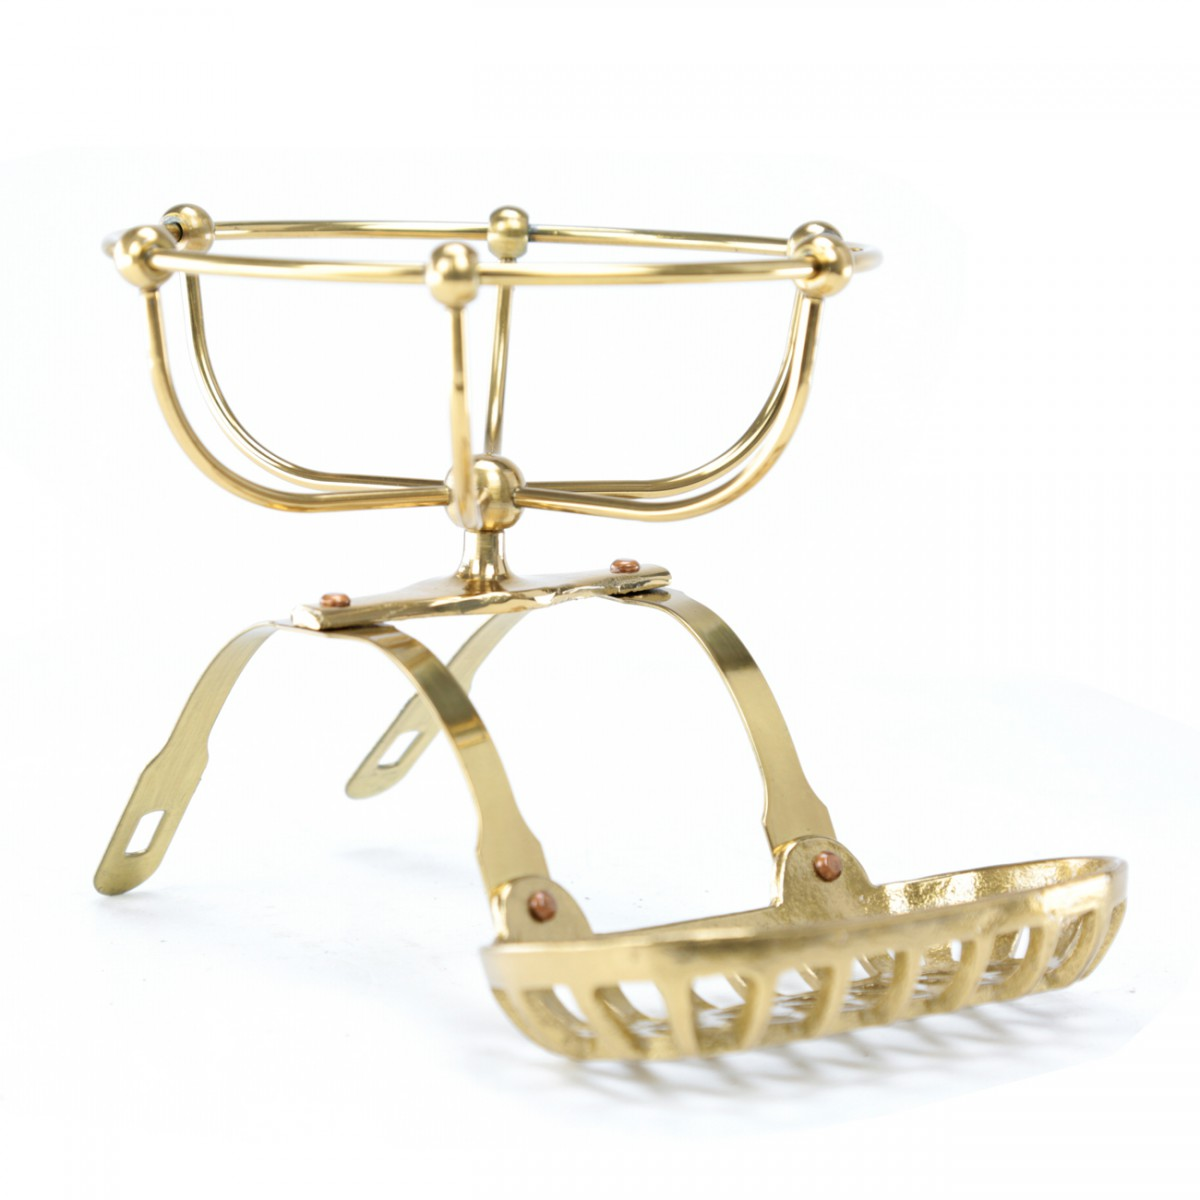 Vintage Clawfoot Tub Soap Dish Sponge Holder Brass